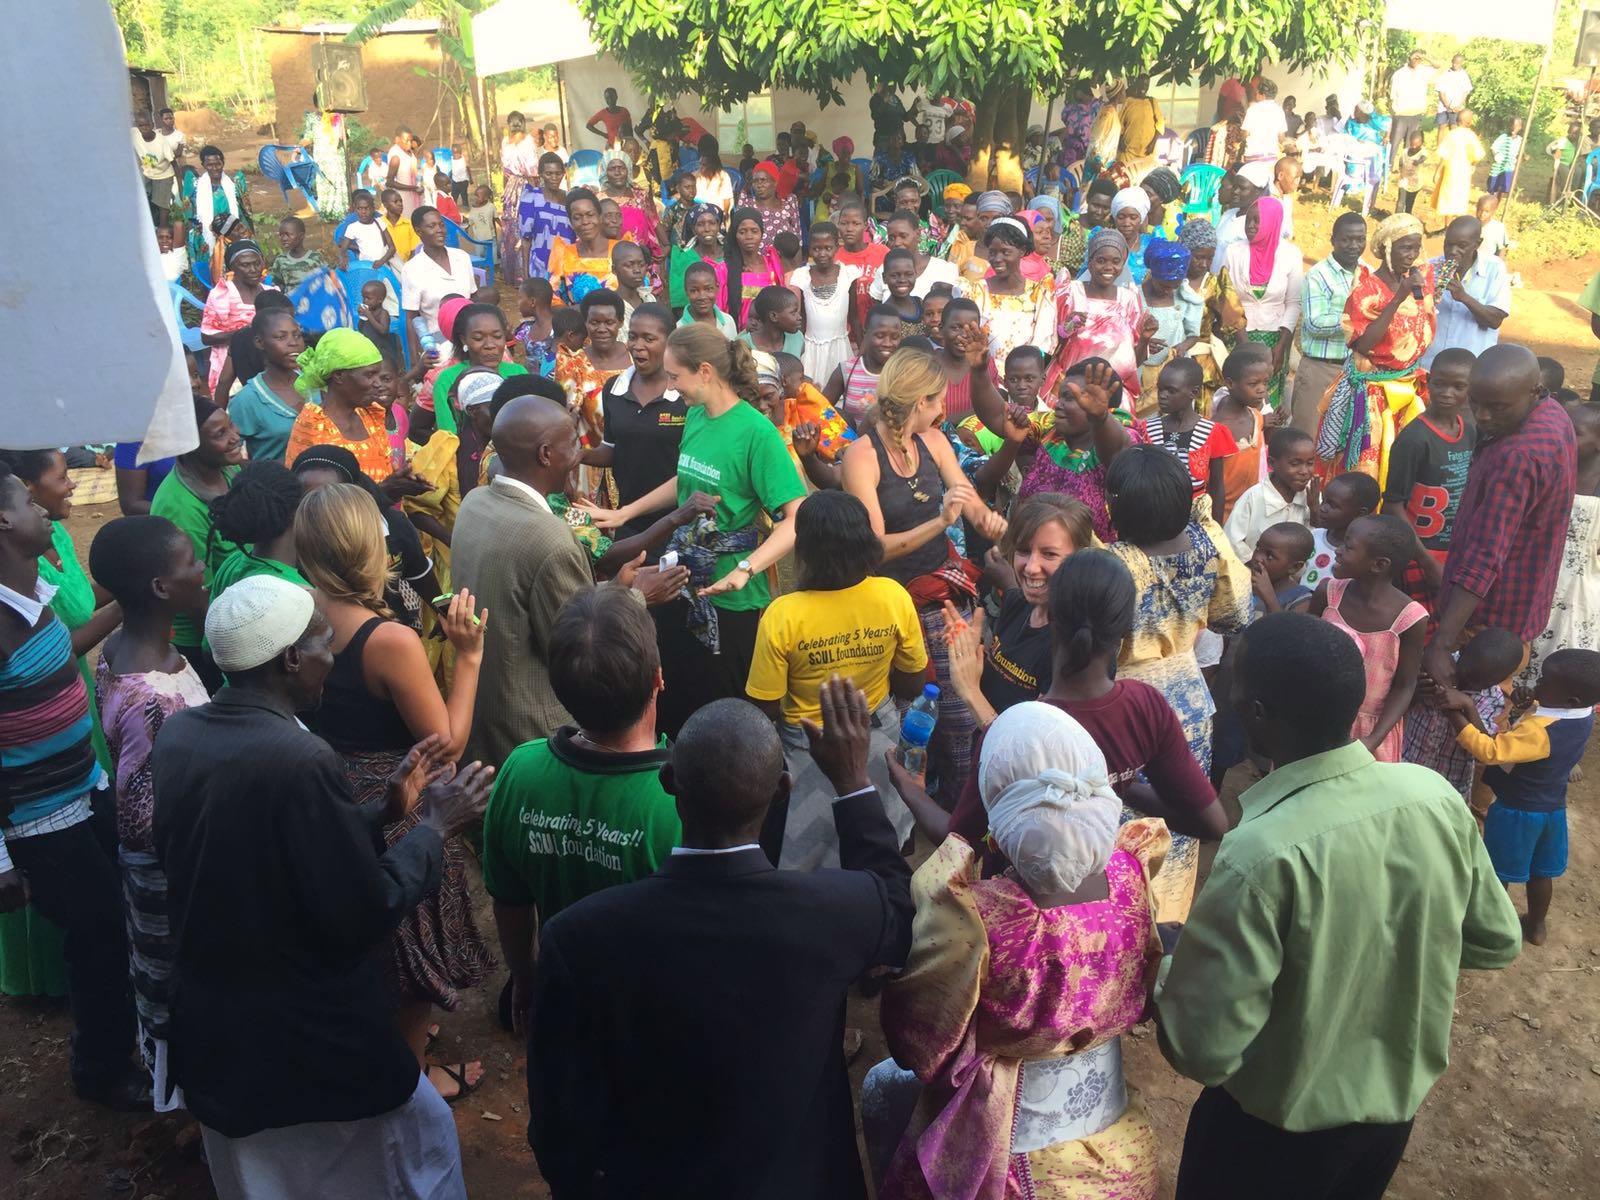 Iganga community members and S.O.U.L.staff celebrate the new initiative